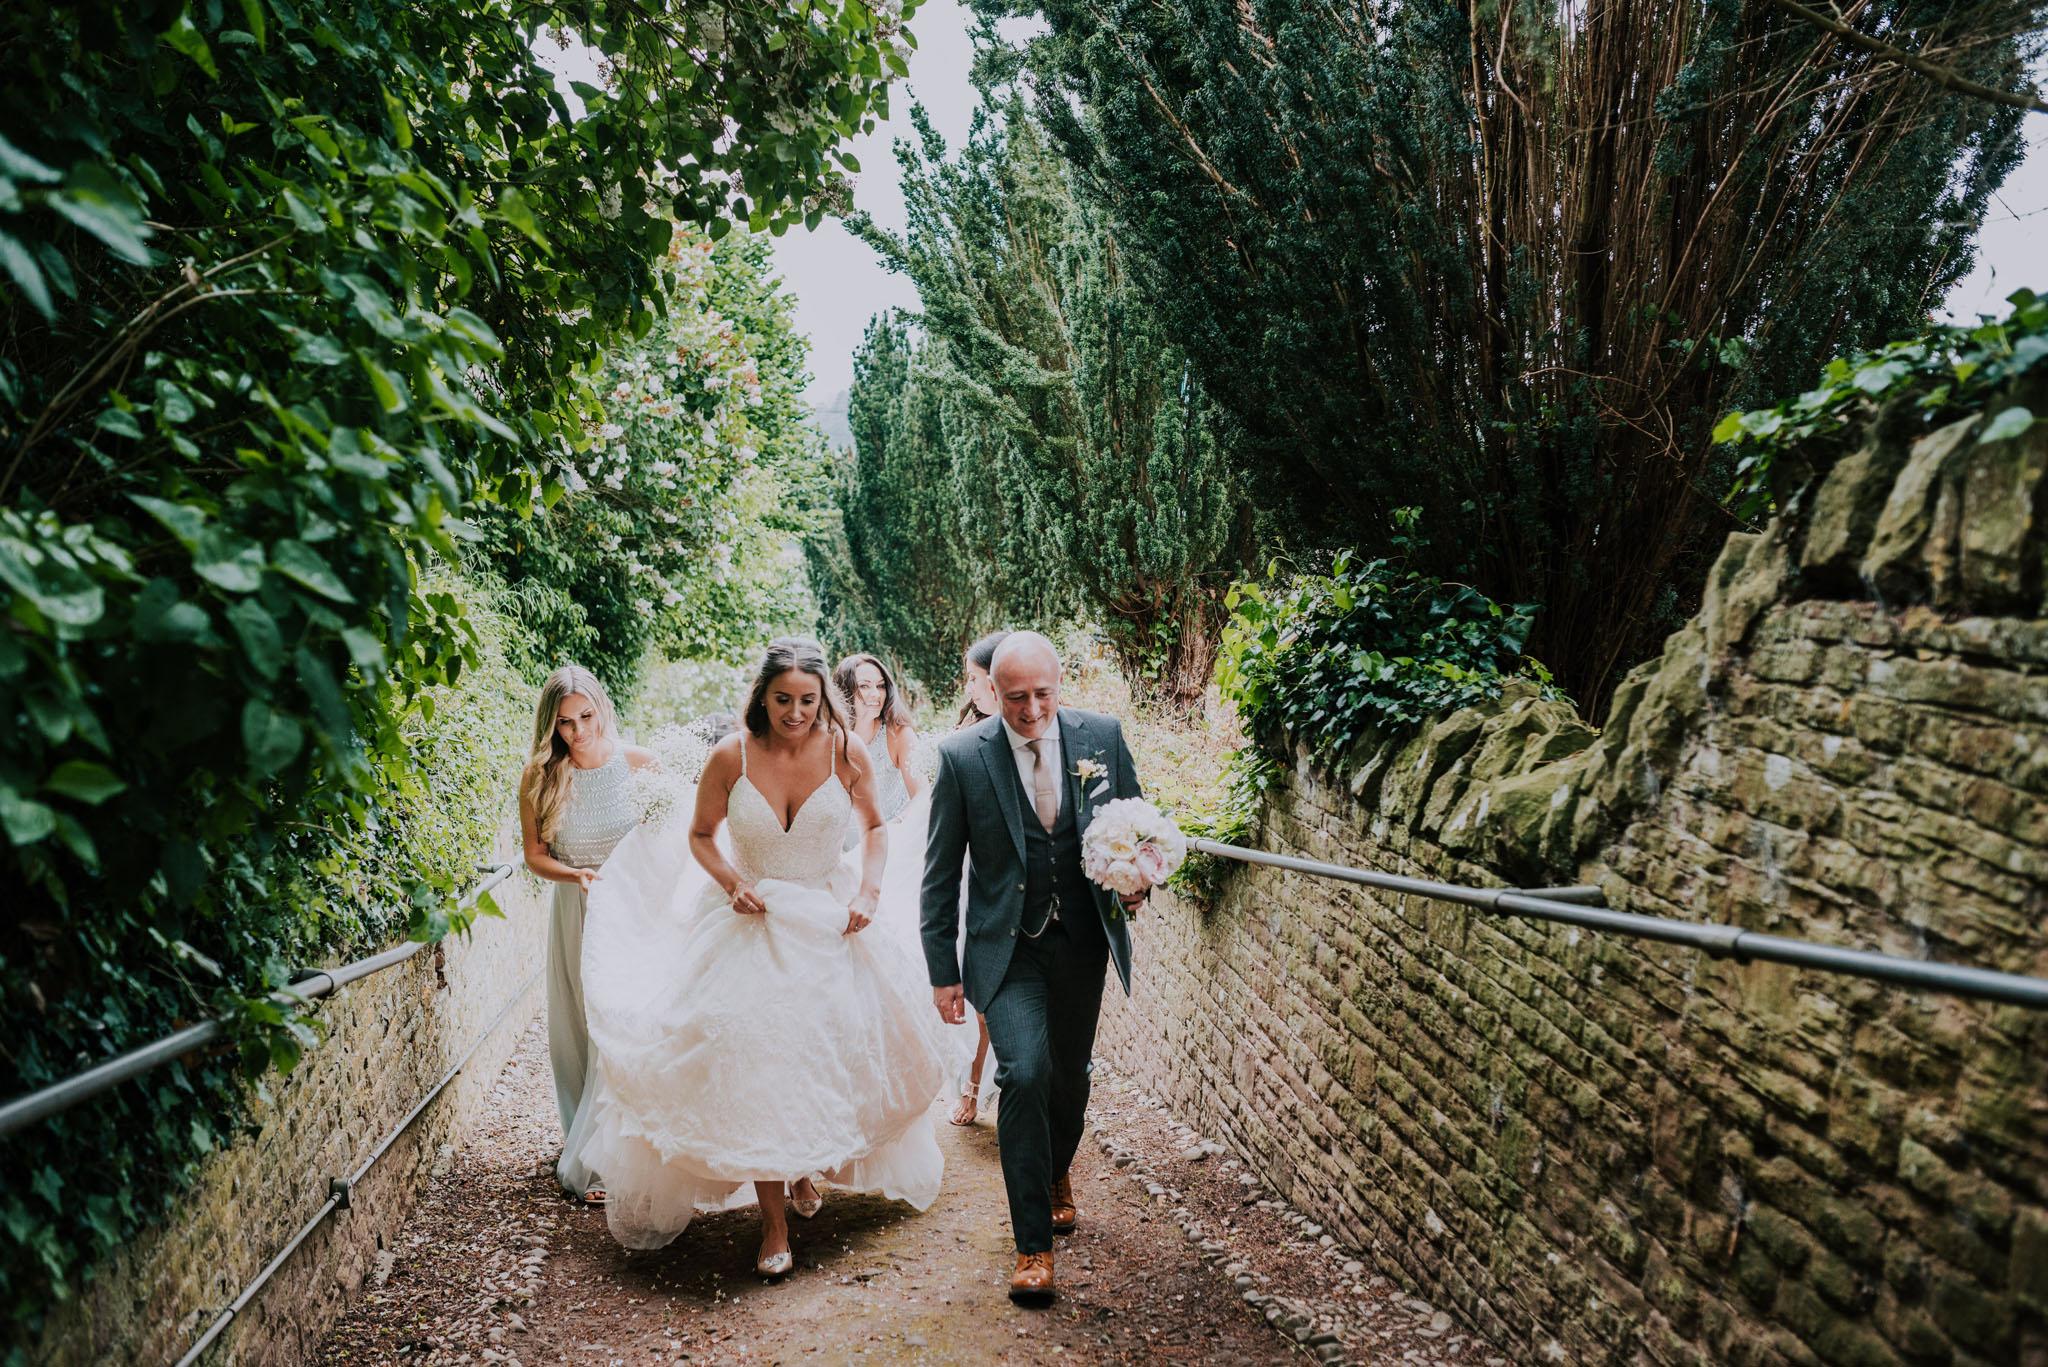 wedding-photographer-glewstone-court-hereford-scott-stockwell-photography146.jpg